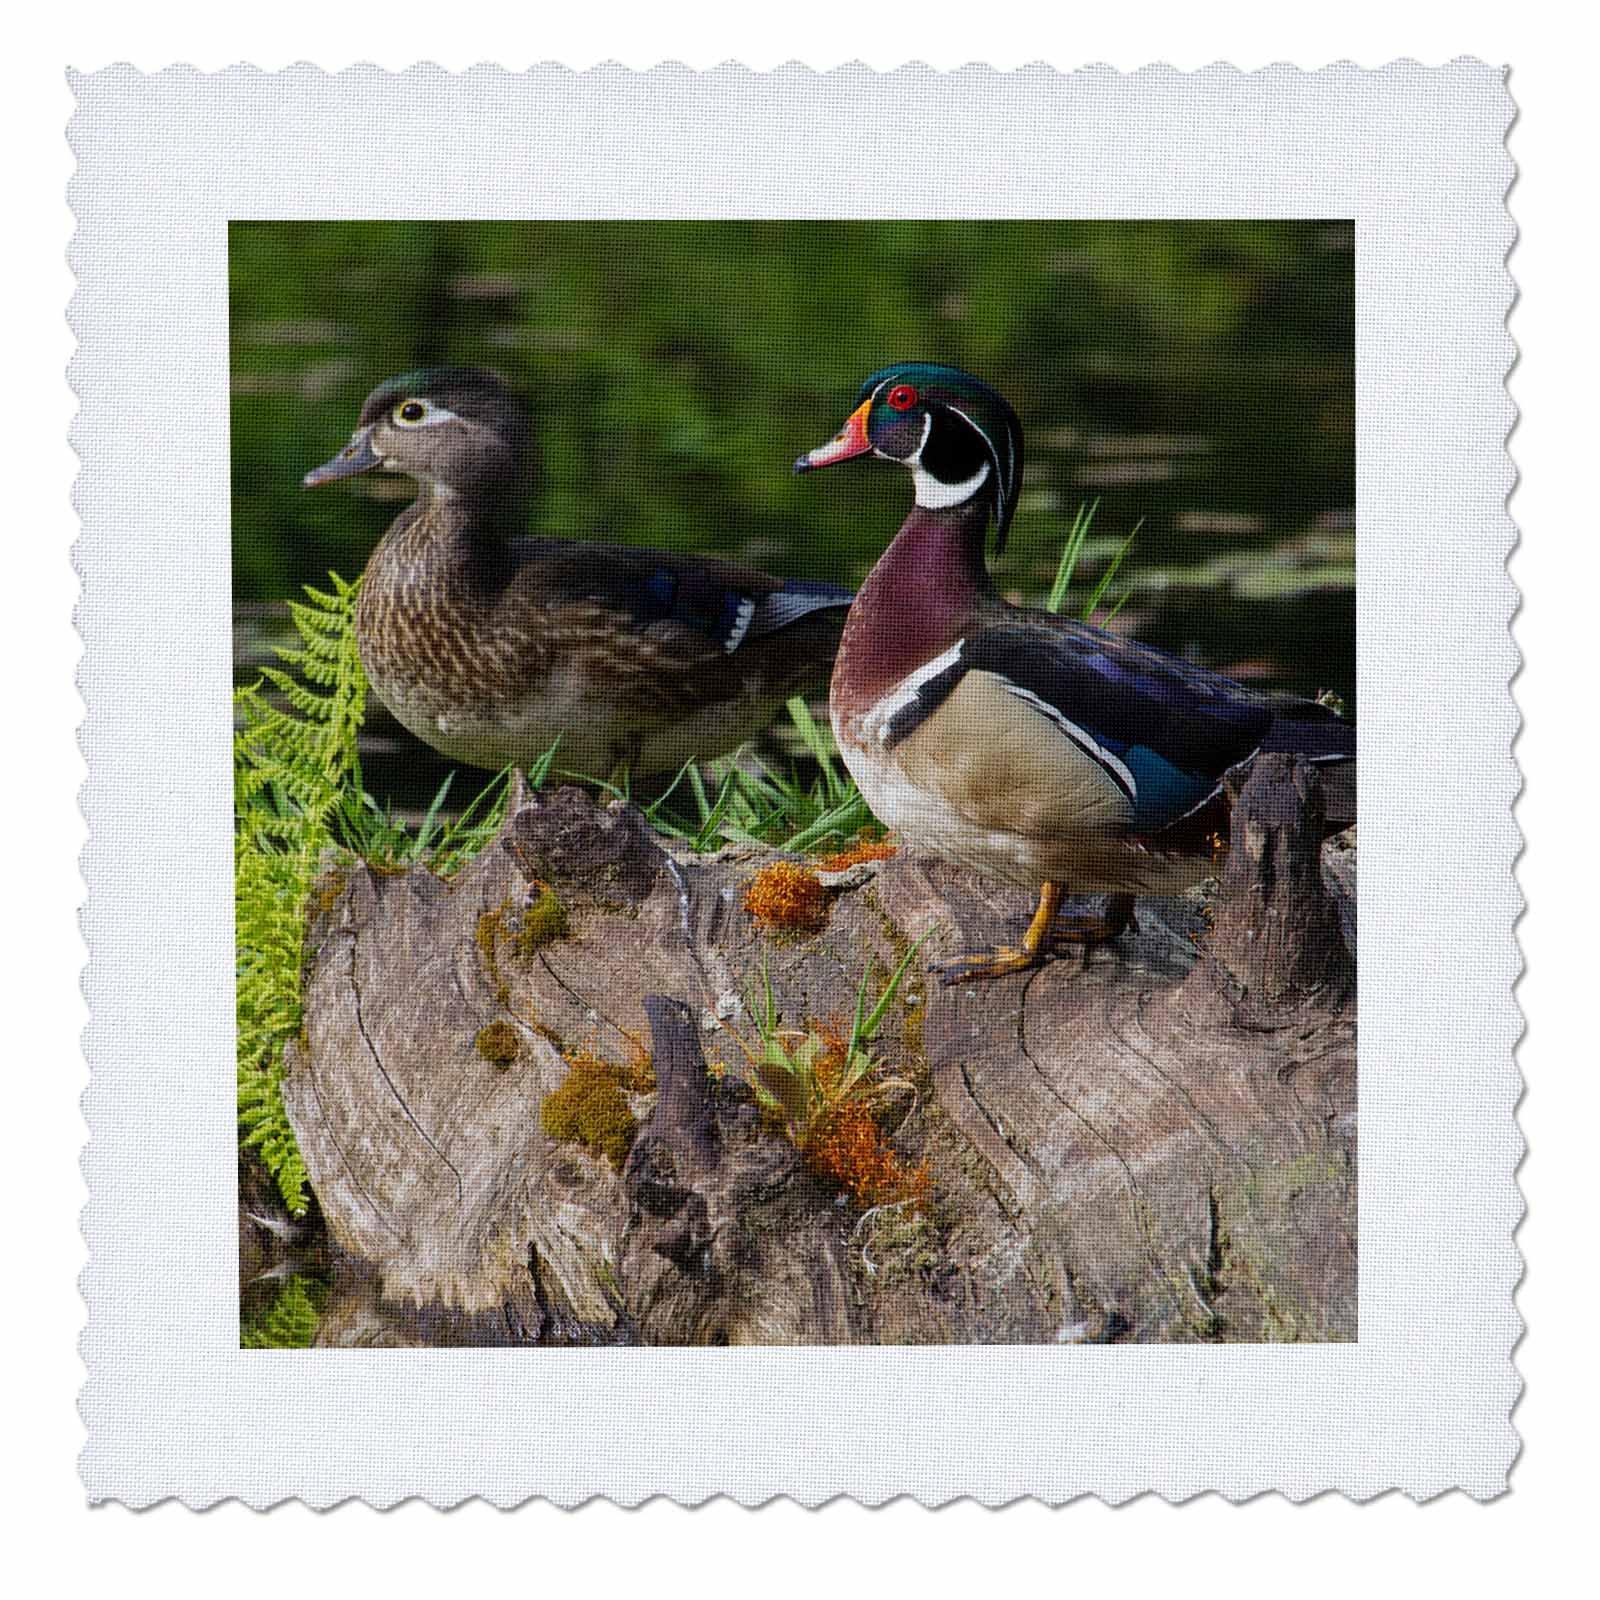 3dRose Danita Delimont - Ducks - Wood Duck Pair - 20x20 inch quilt square (qs_278079_8)